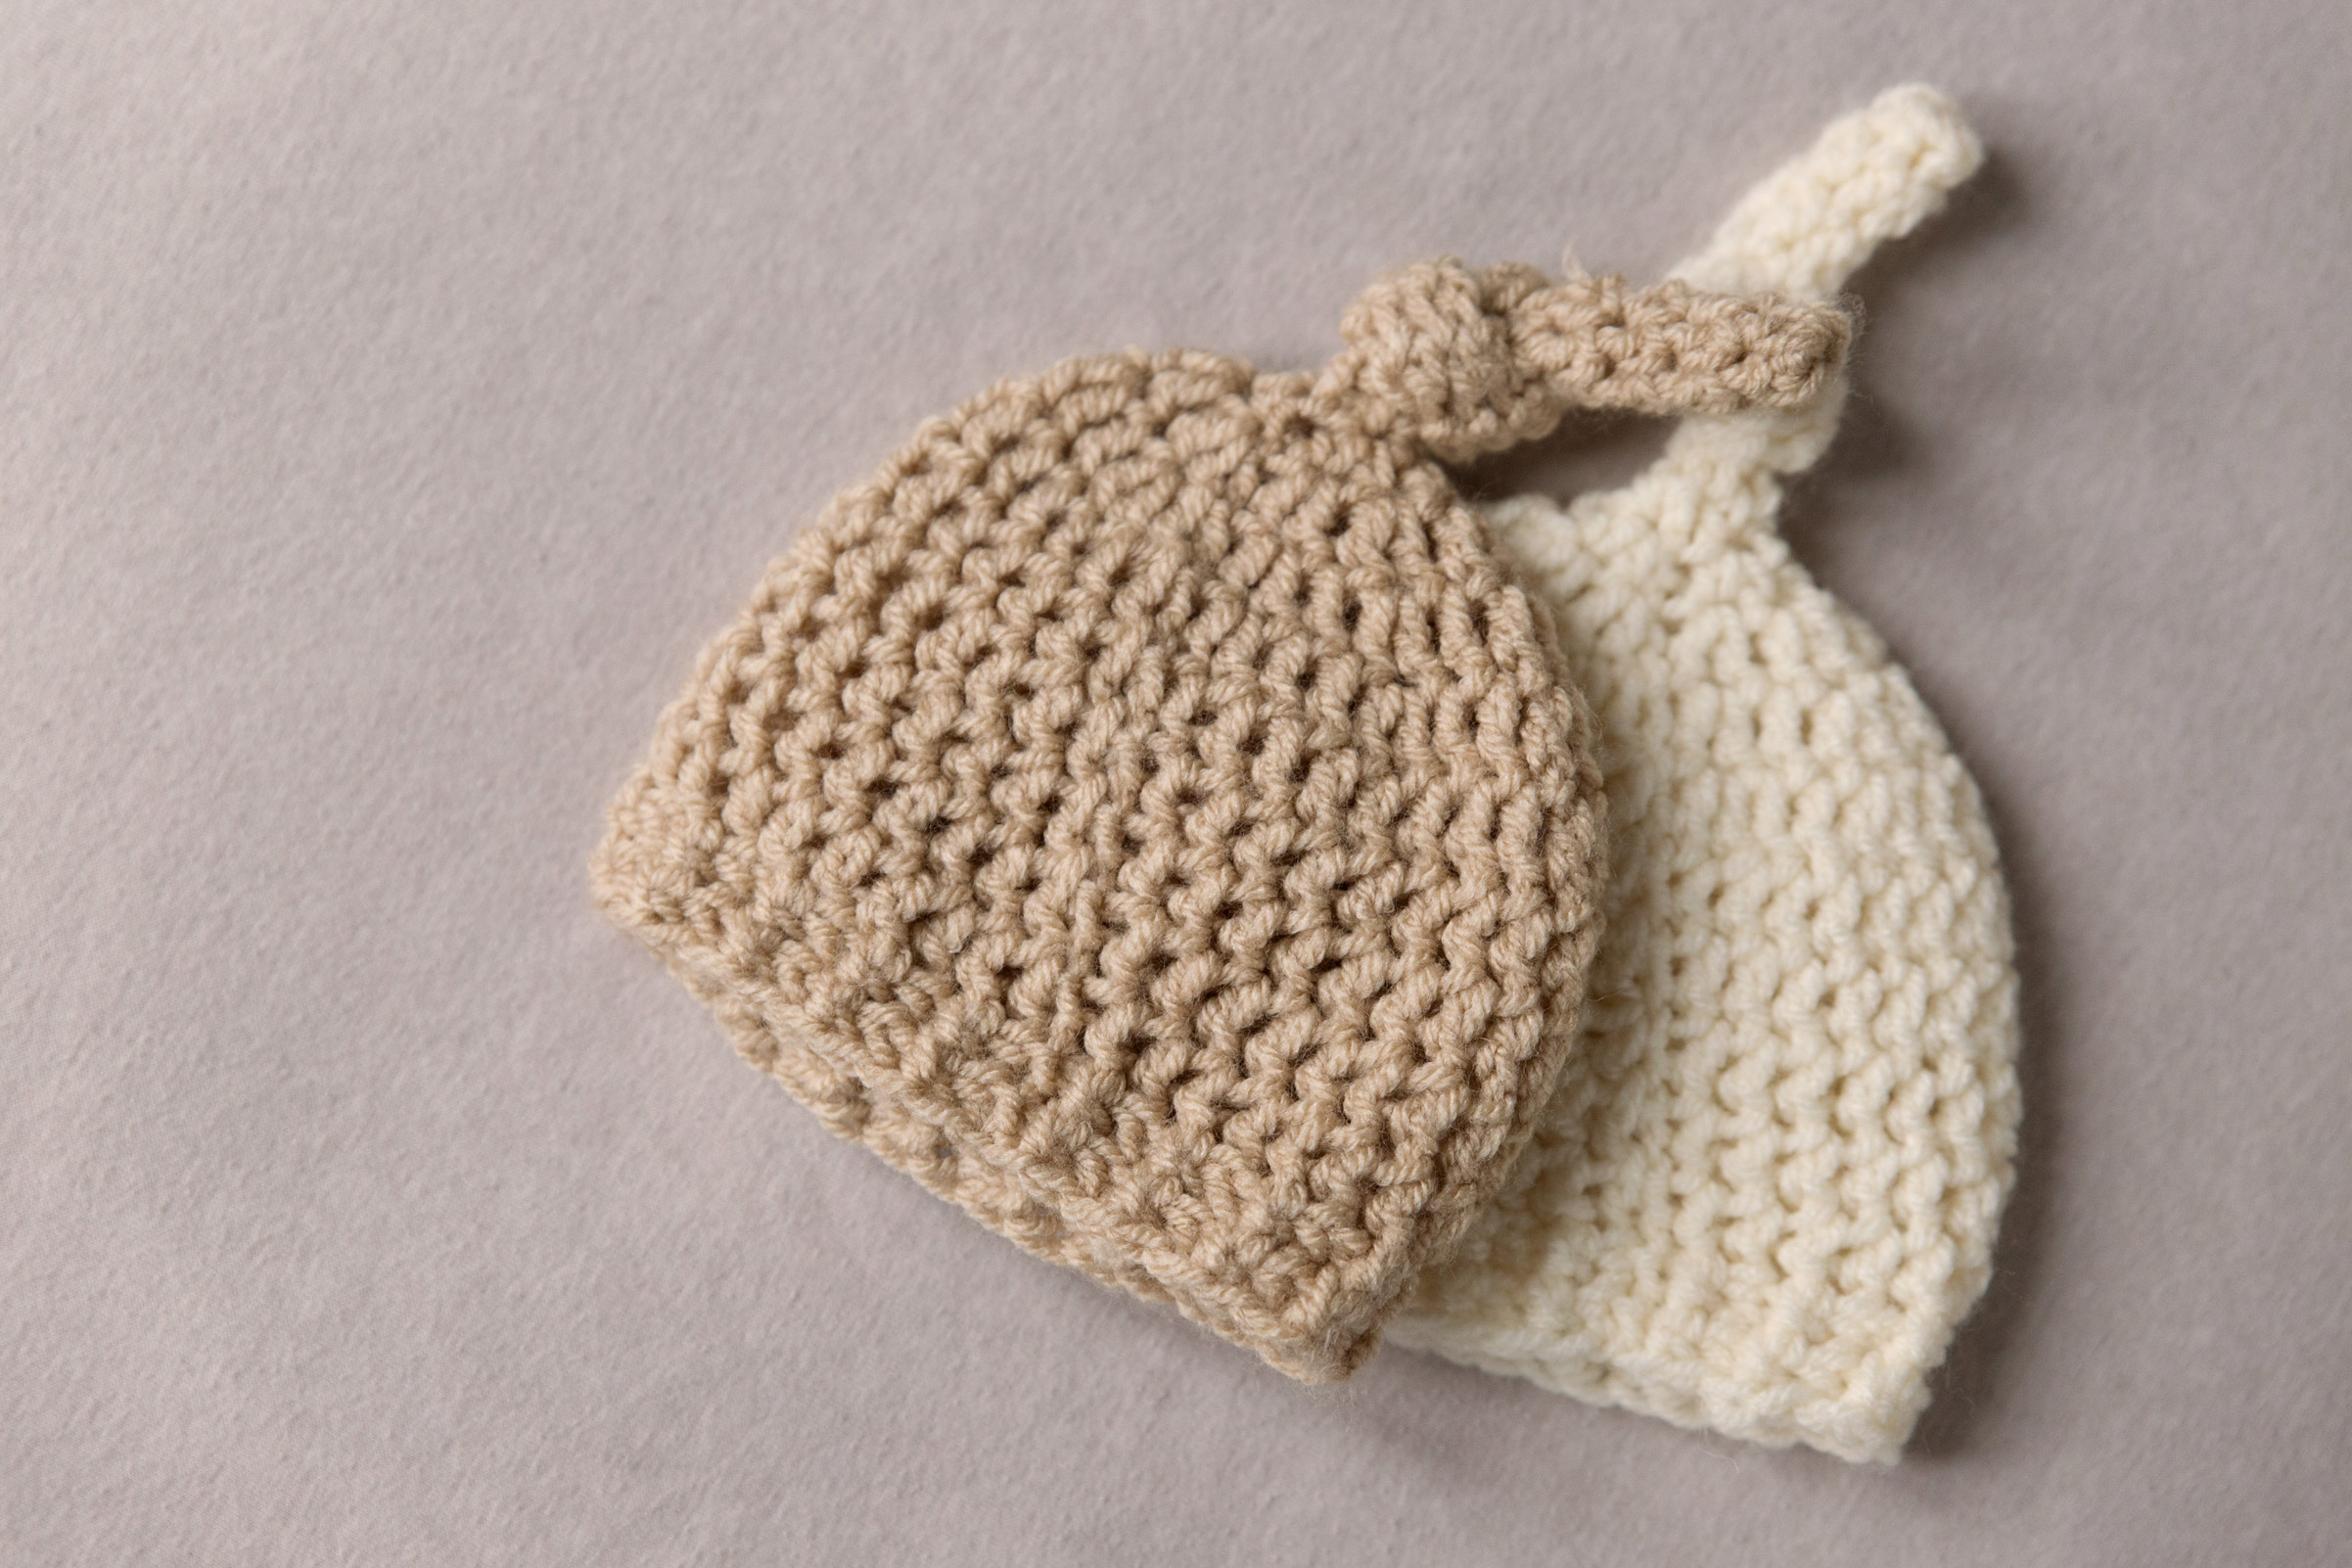 newborn-photos-st-albans-props-hats.jpg